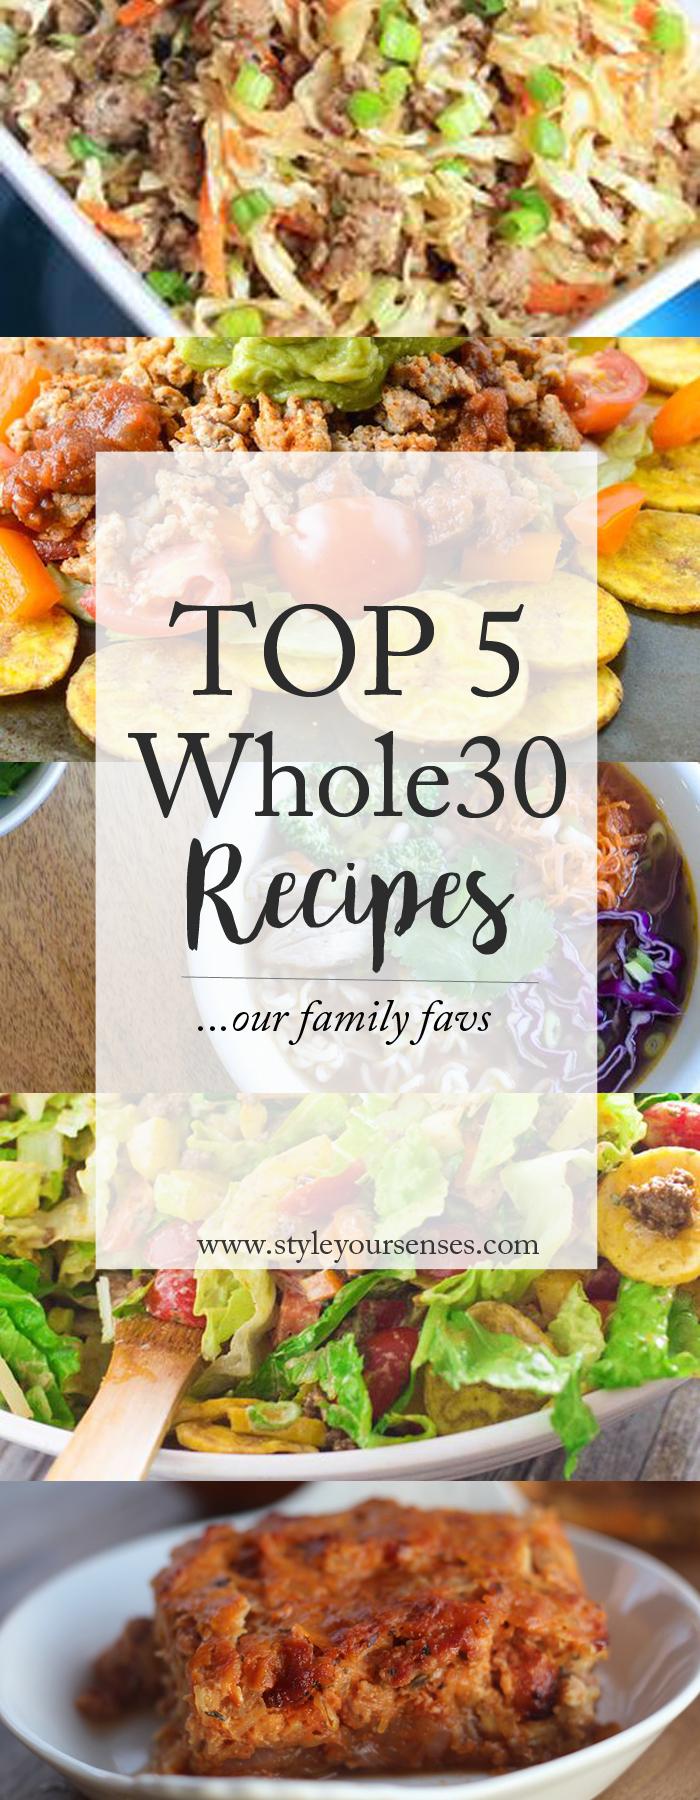 Whole30 Favorite Recipes